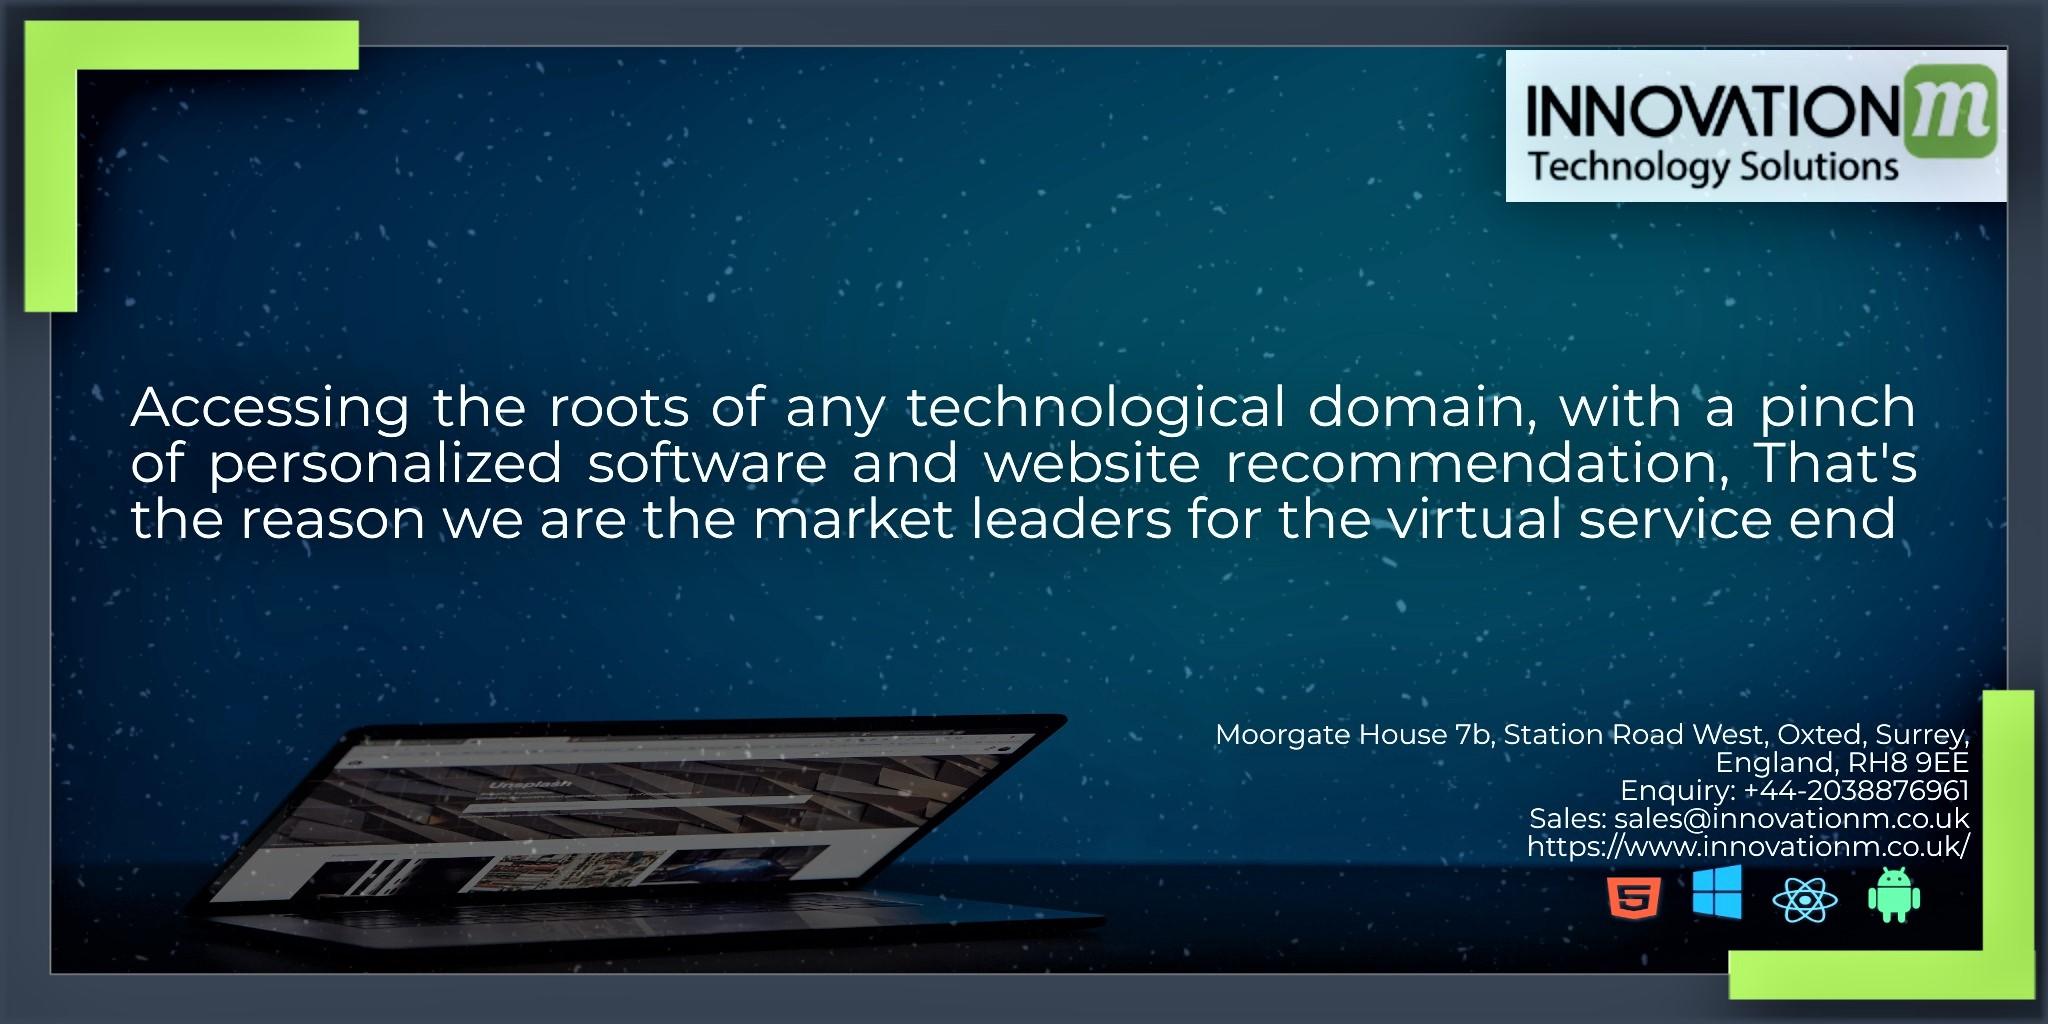 InnovationMUK is the best development agency brighton and mobile development agency london, UK.